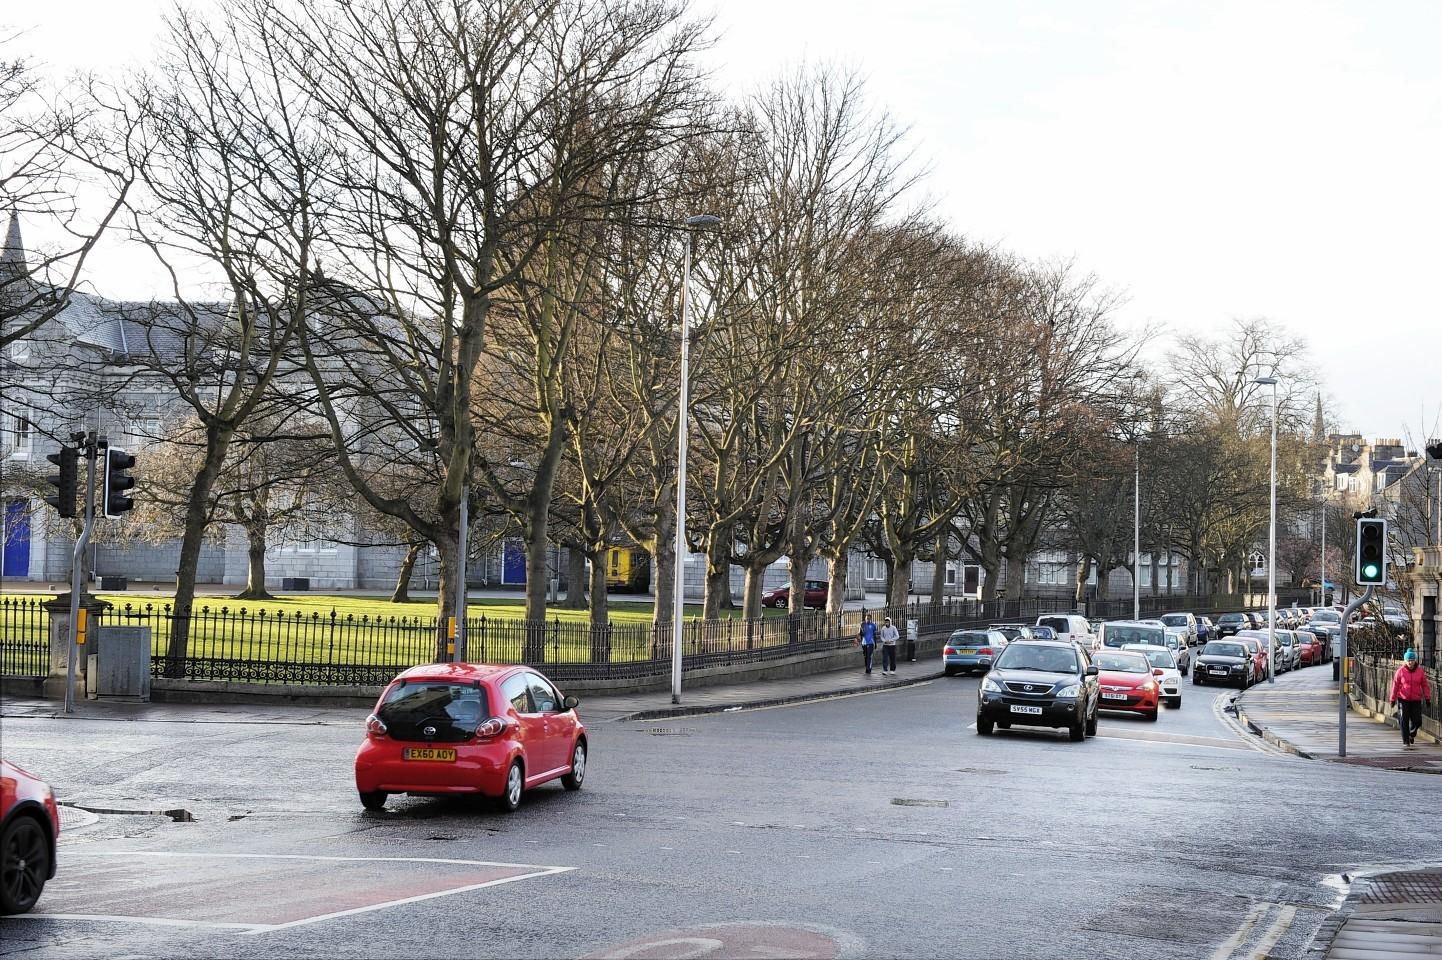 This picture of Aberdeen Grammar School was taken last week